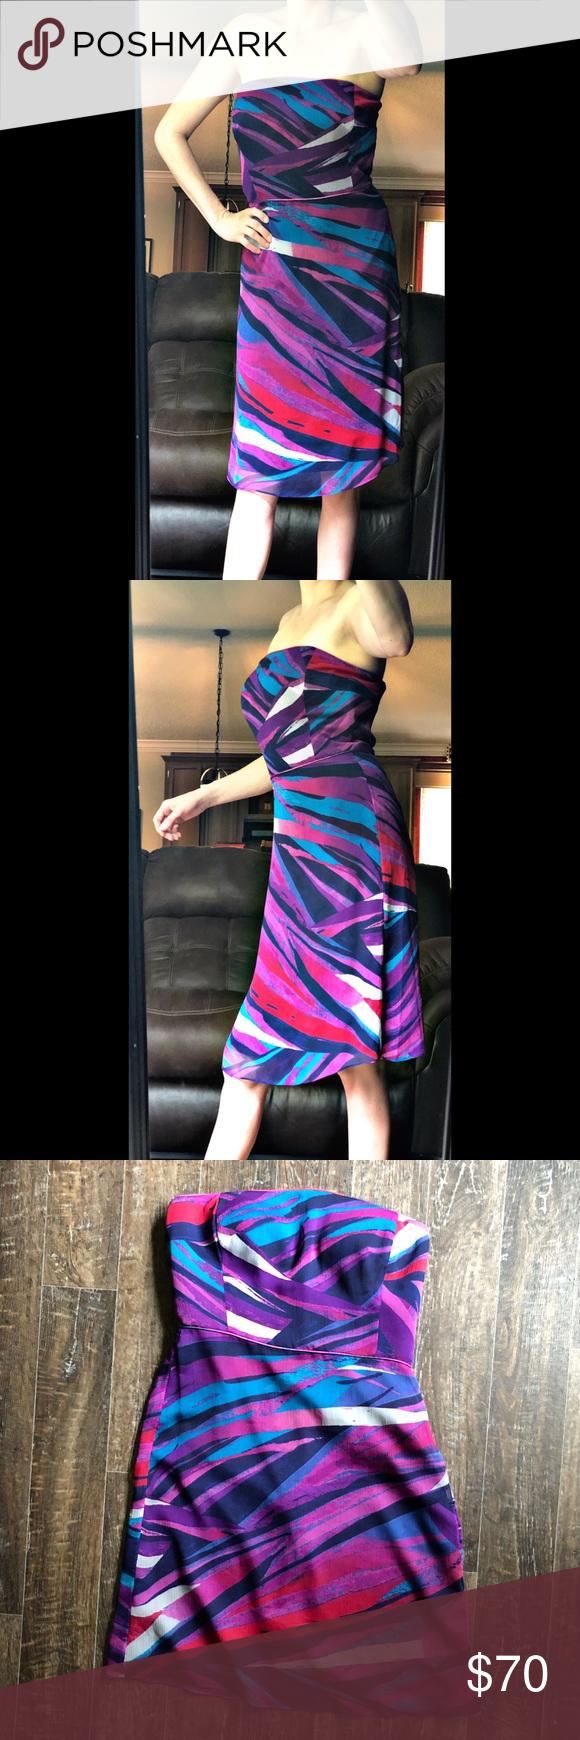 20b5f79dd5b84 Banana Republic Multicolored Dress Size 10